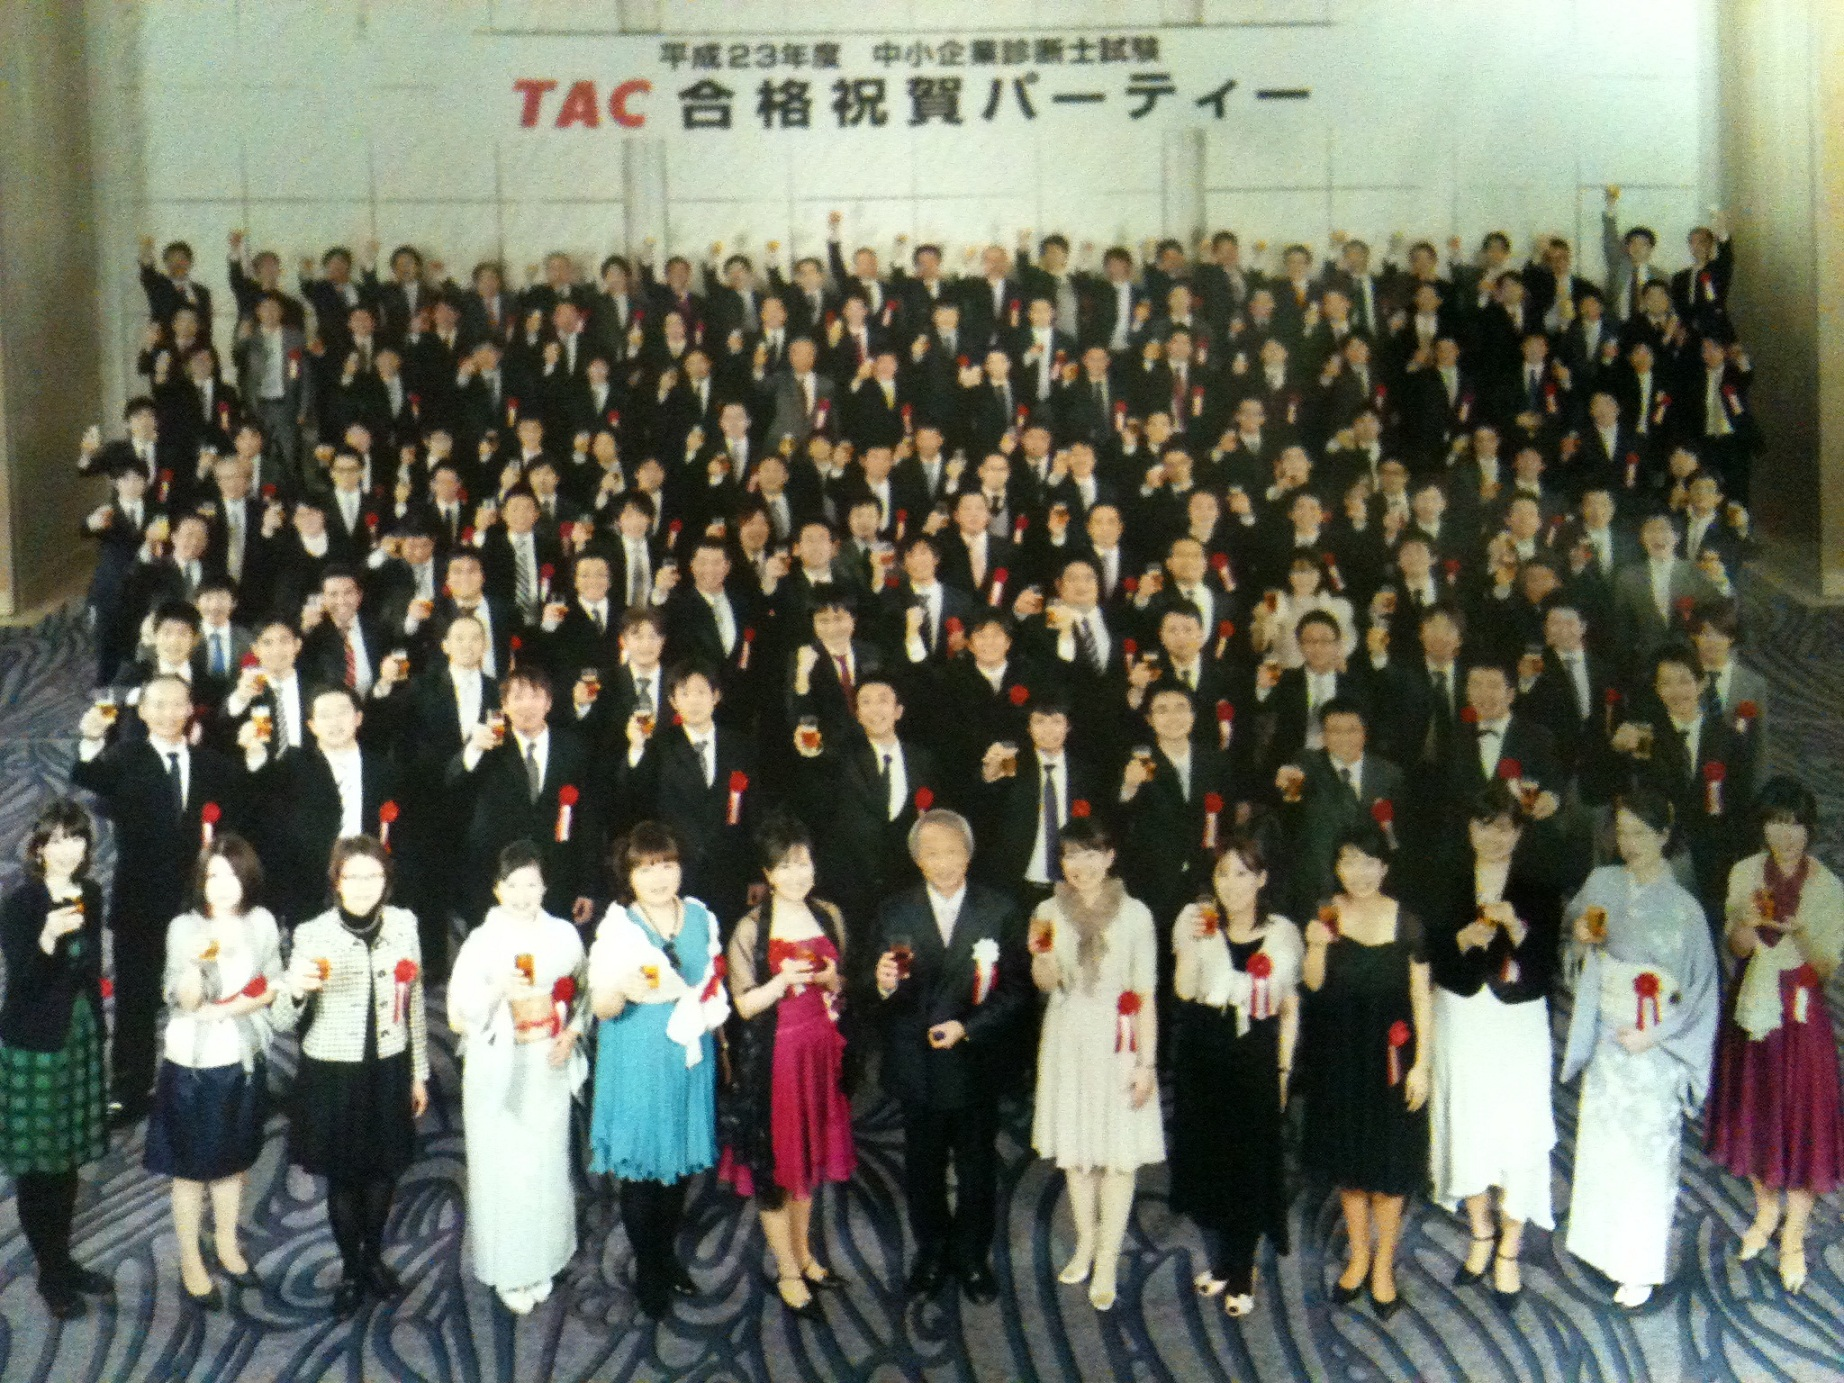 TAC合格祝賀会集合写真